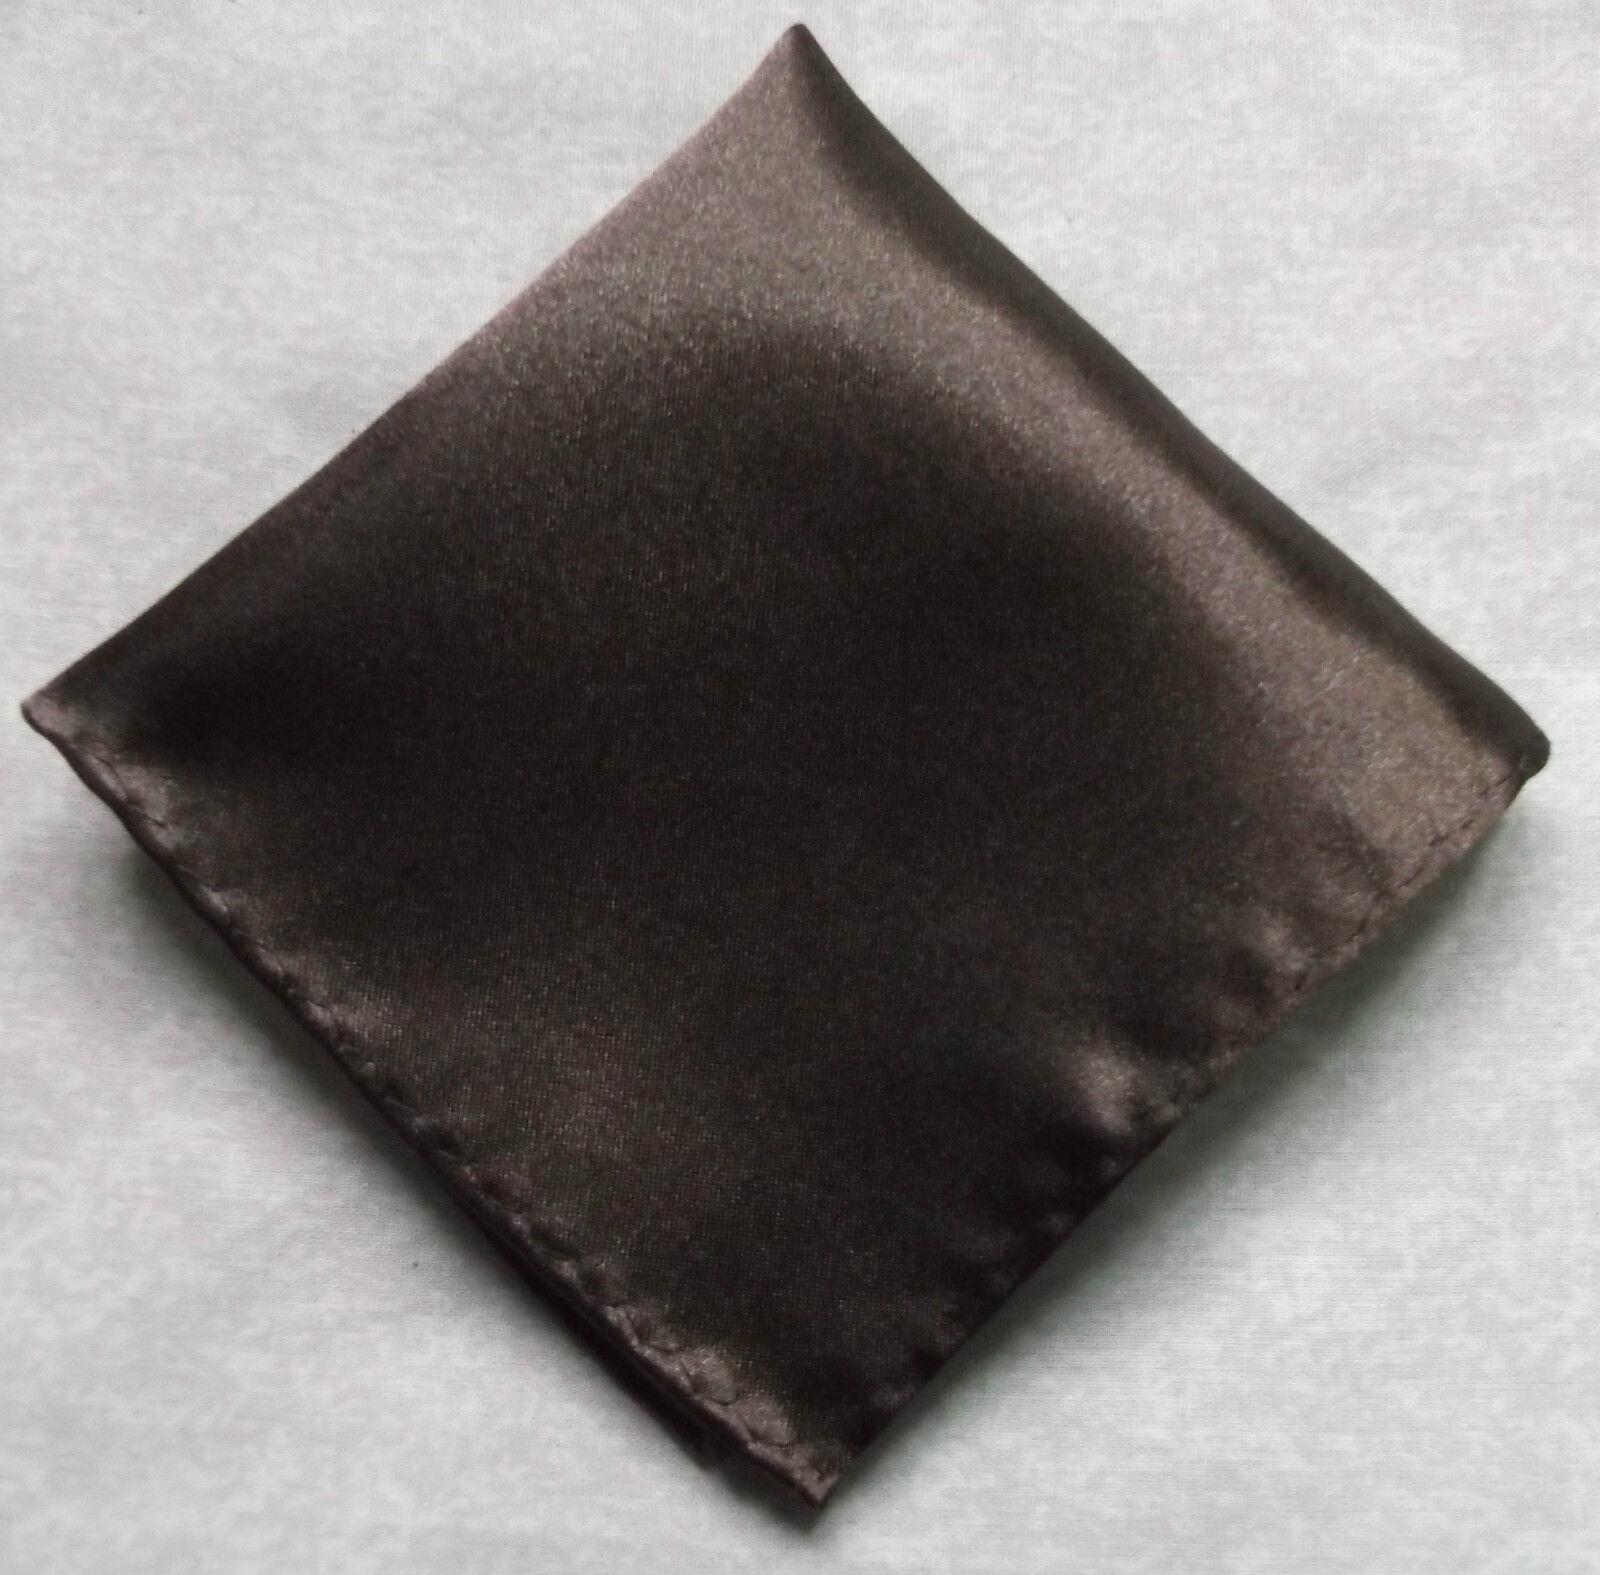 Handkerchief MENS Top Pocket Square Hankie Silky Shiny DARK BROWN